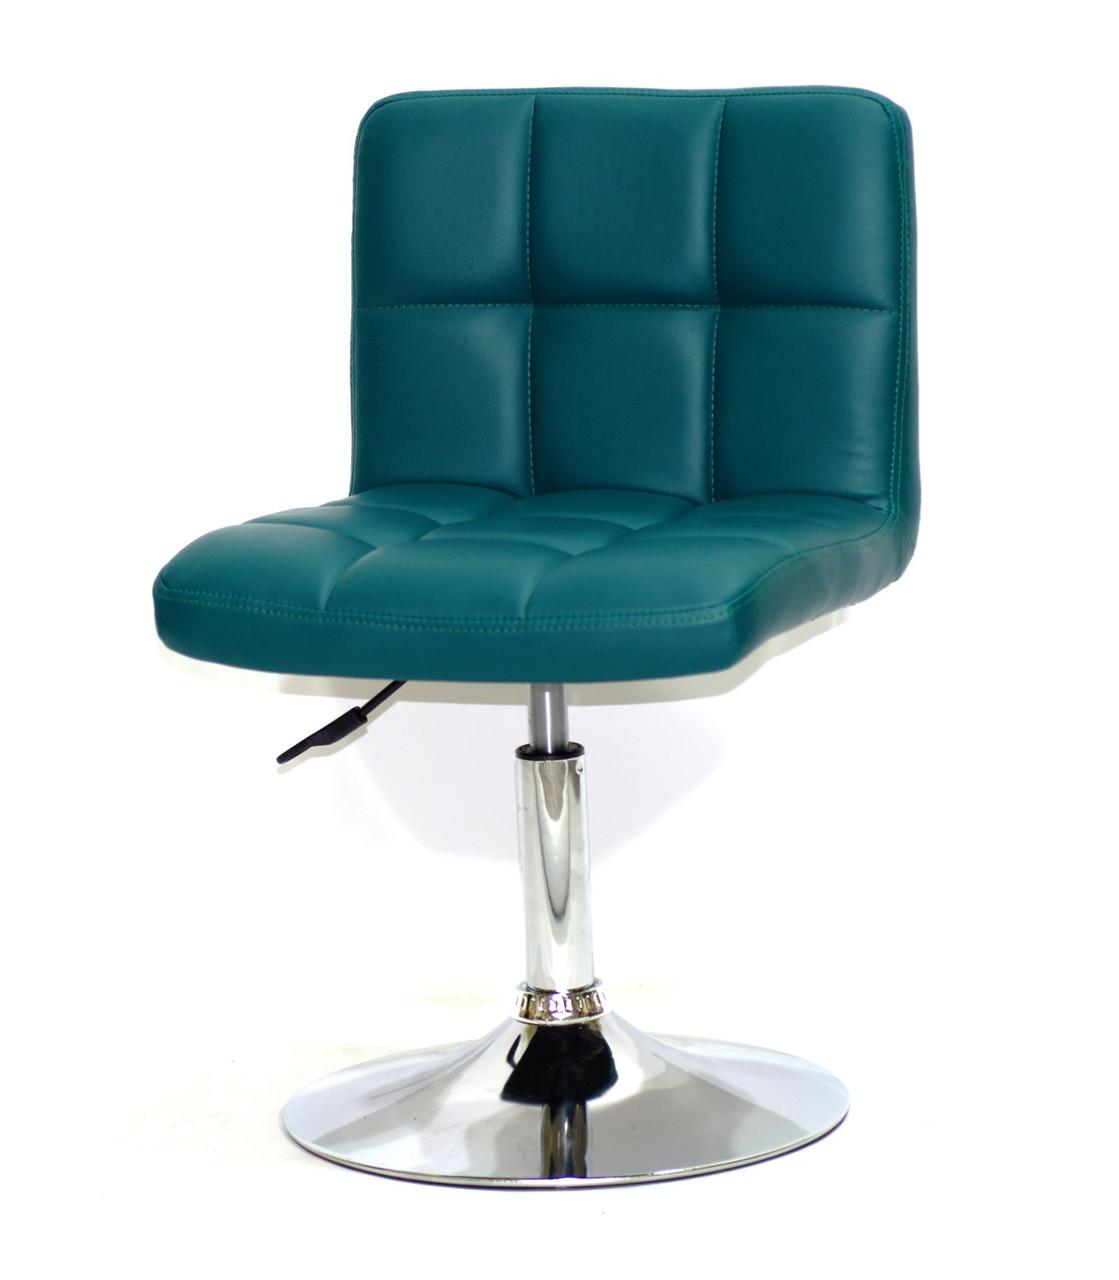 Кресло мастера Arno С Base, зеленое